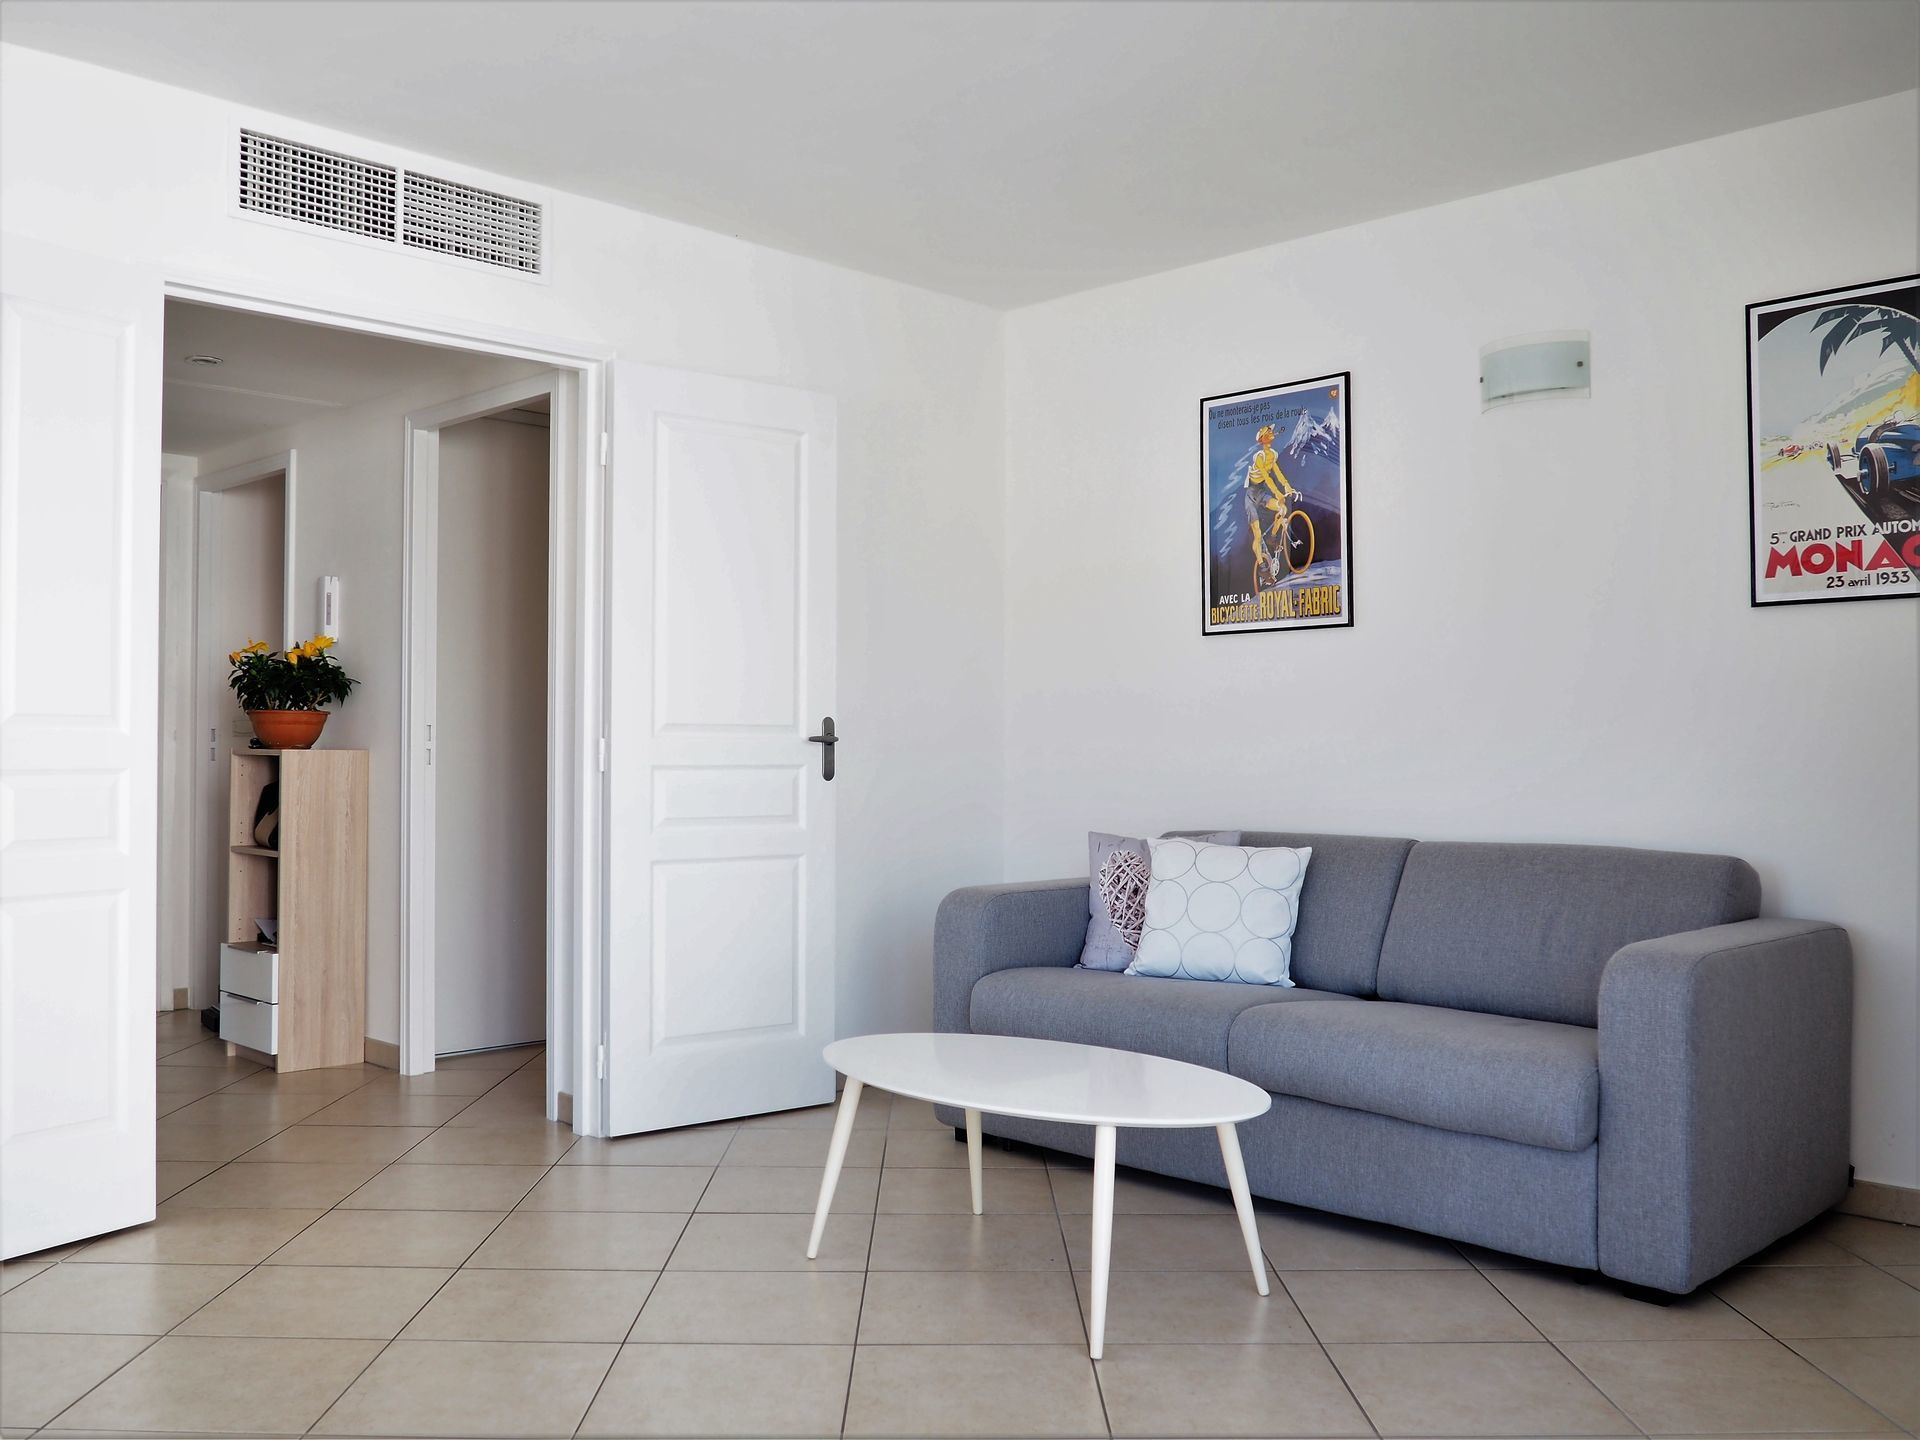 Le Jardin De Daphne - Cannes: Vacation Rental That Sleeps 6 ... avec Studio De Jardin Prix